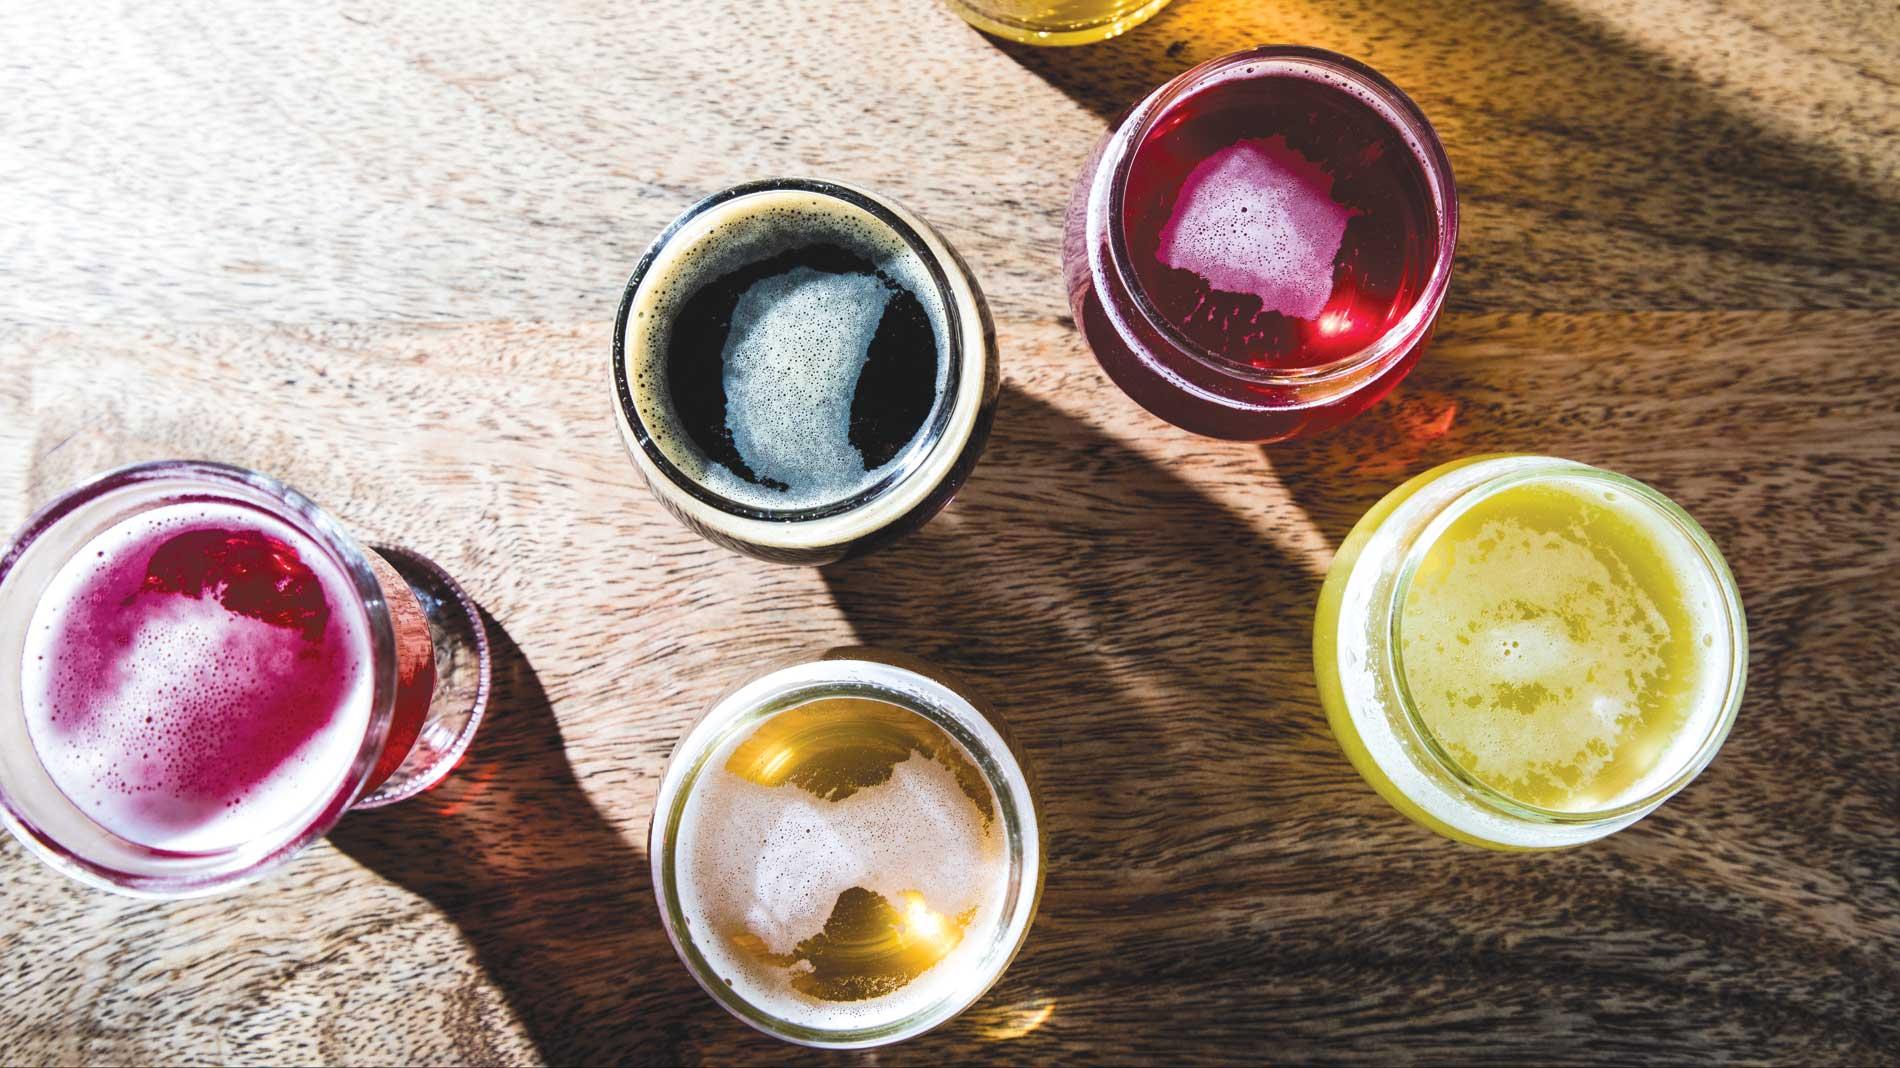 Try fruity ferments like kombucha from Confluence Kombucha in St. Louis.